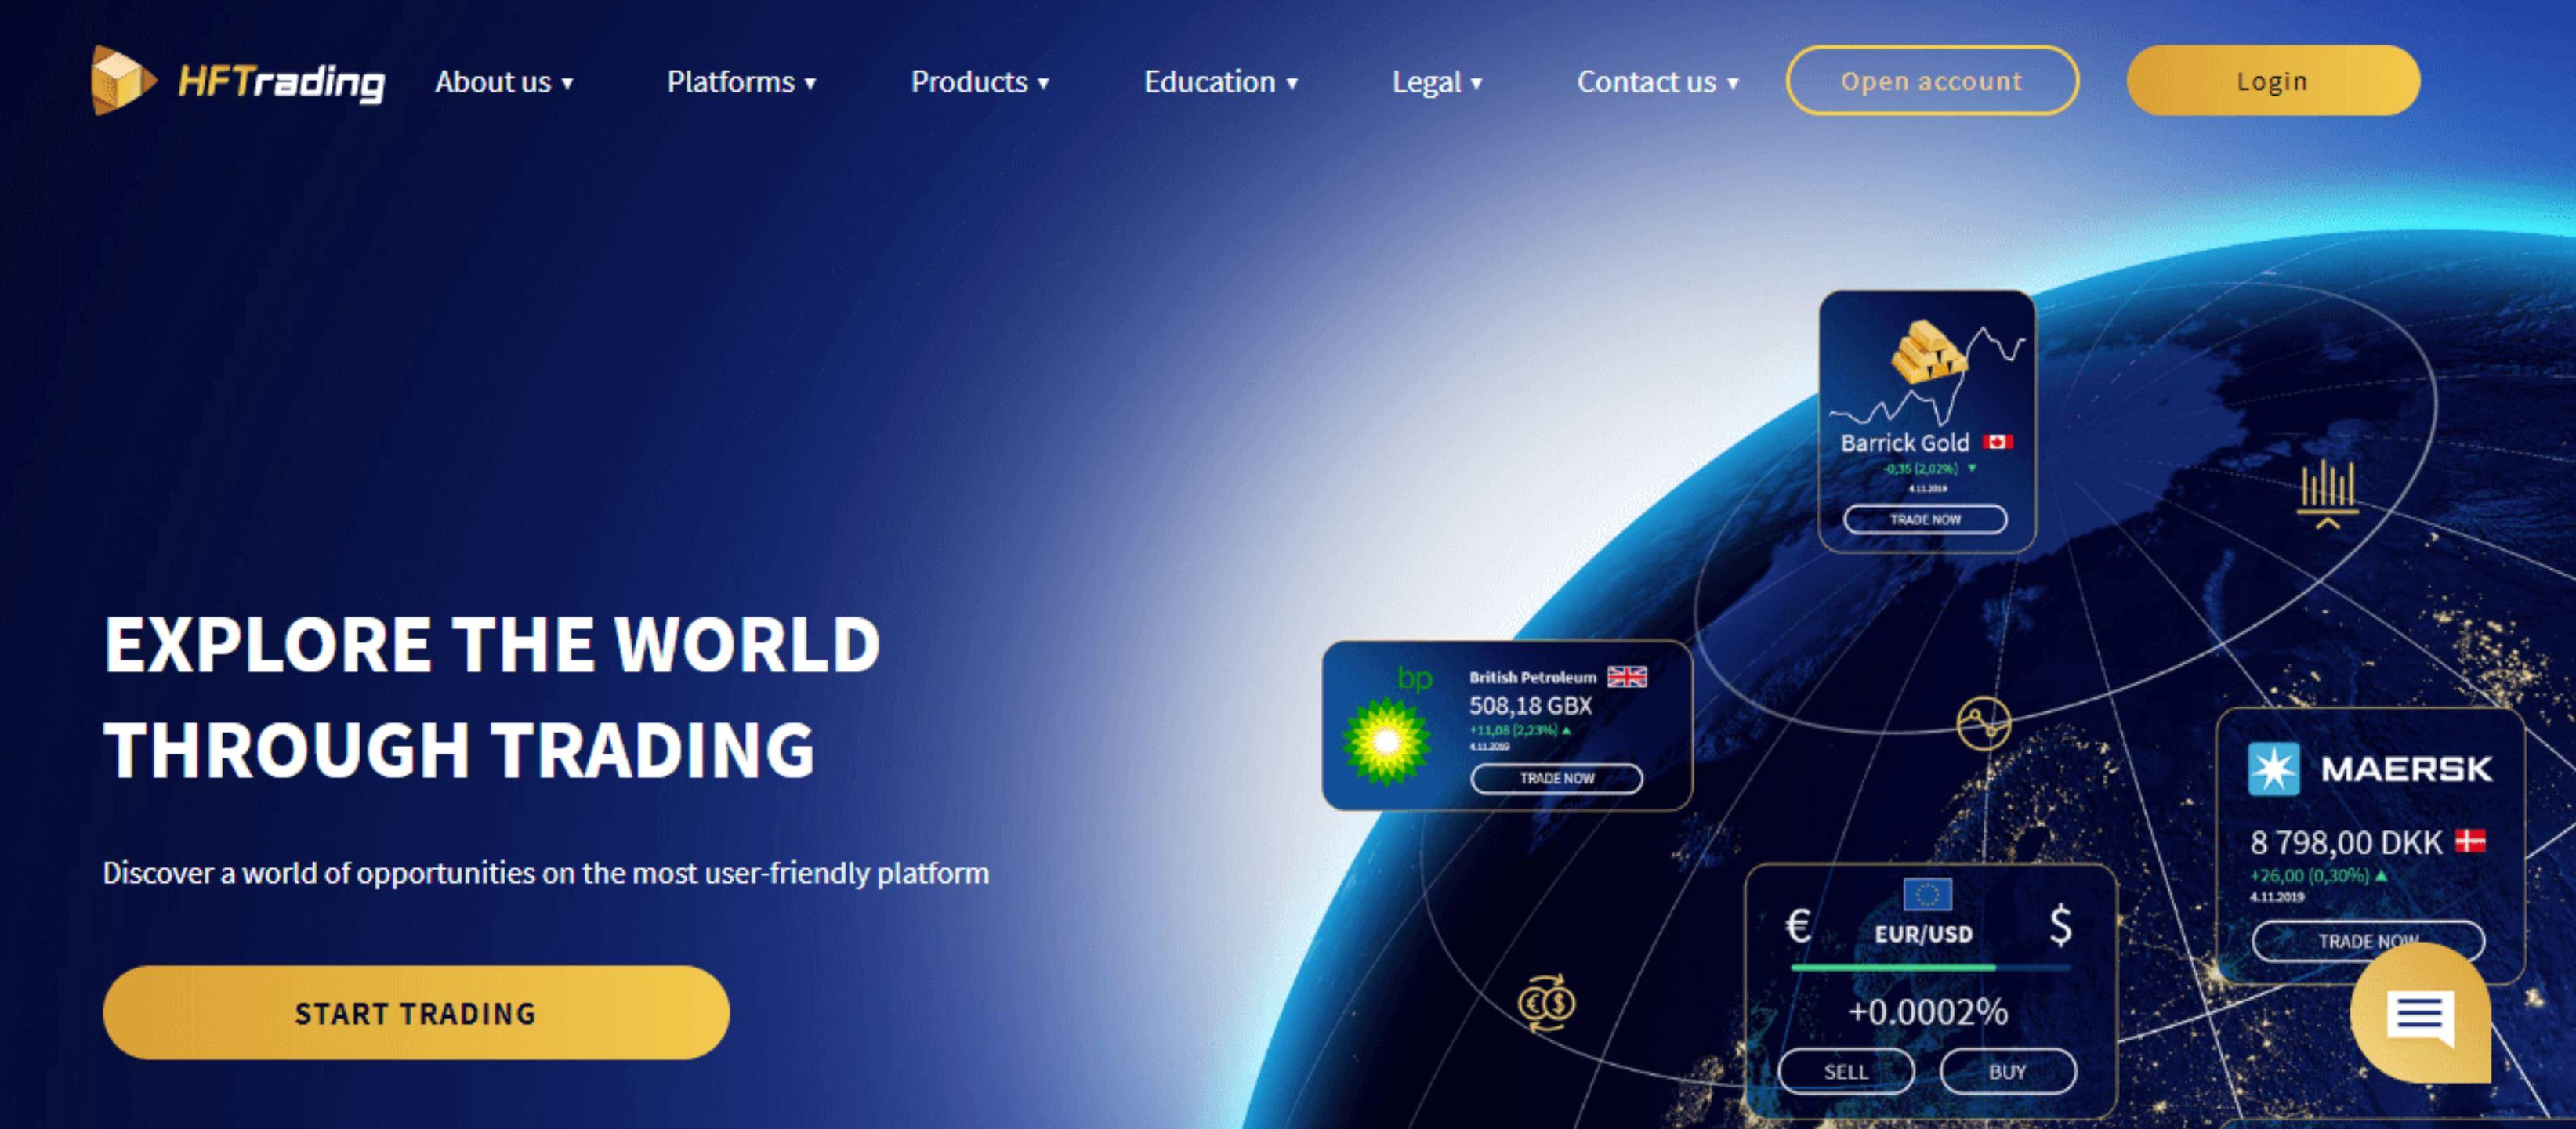 HFTrading website and logo